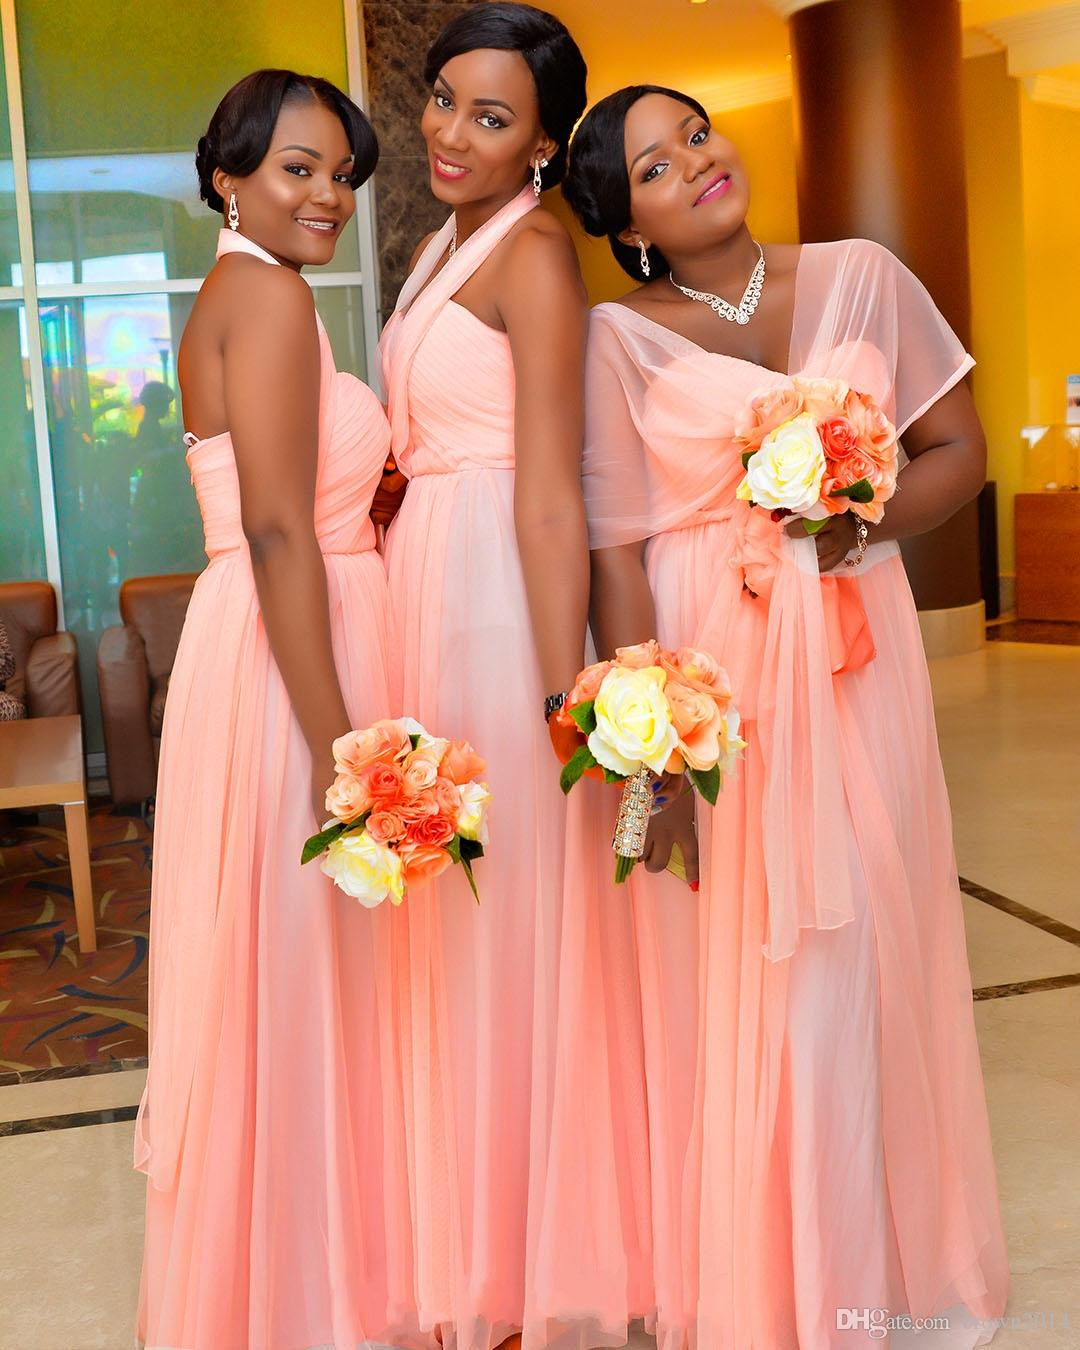 2020 Blush Pink Chiffon Long Bridesmaid Dresses Cheap Sweetheart Convertible Custom Made Formal Wear Gowns Plus Size Wedding Guest Dress